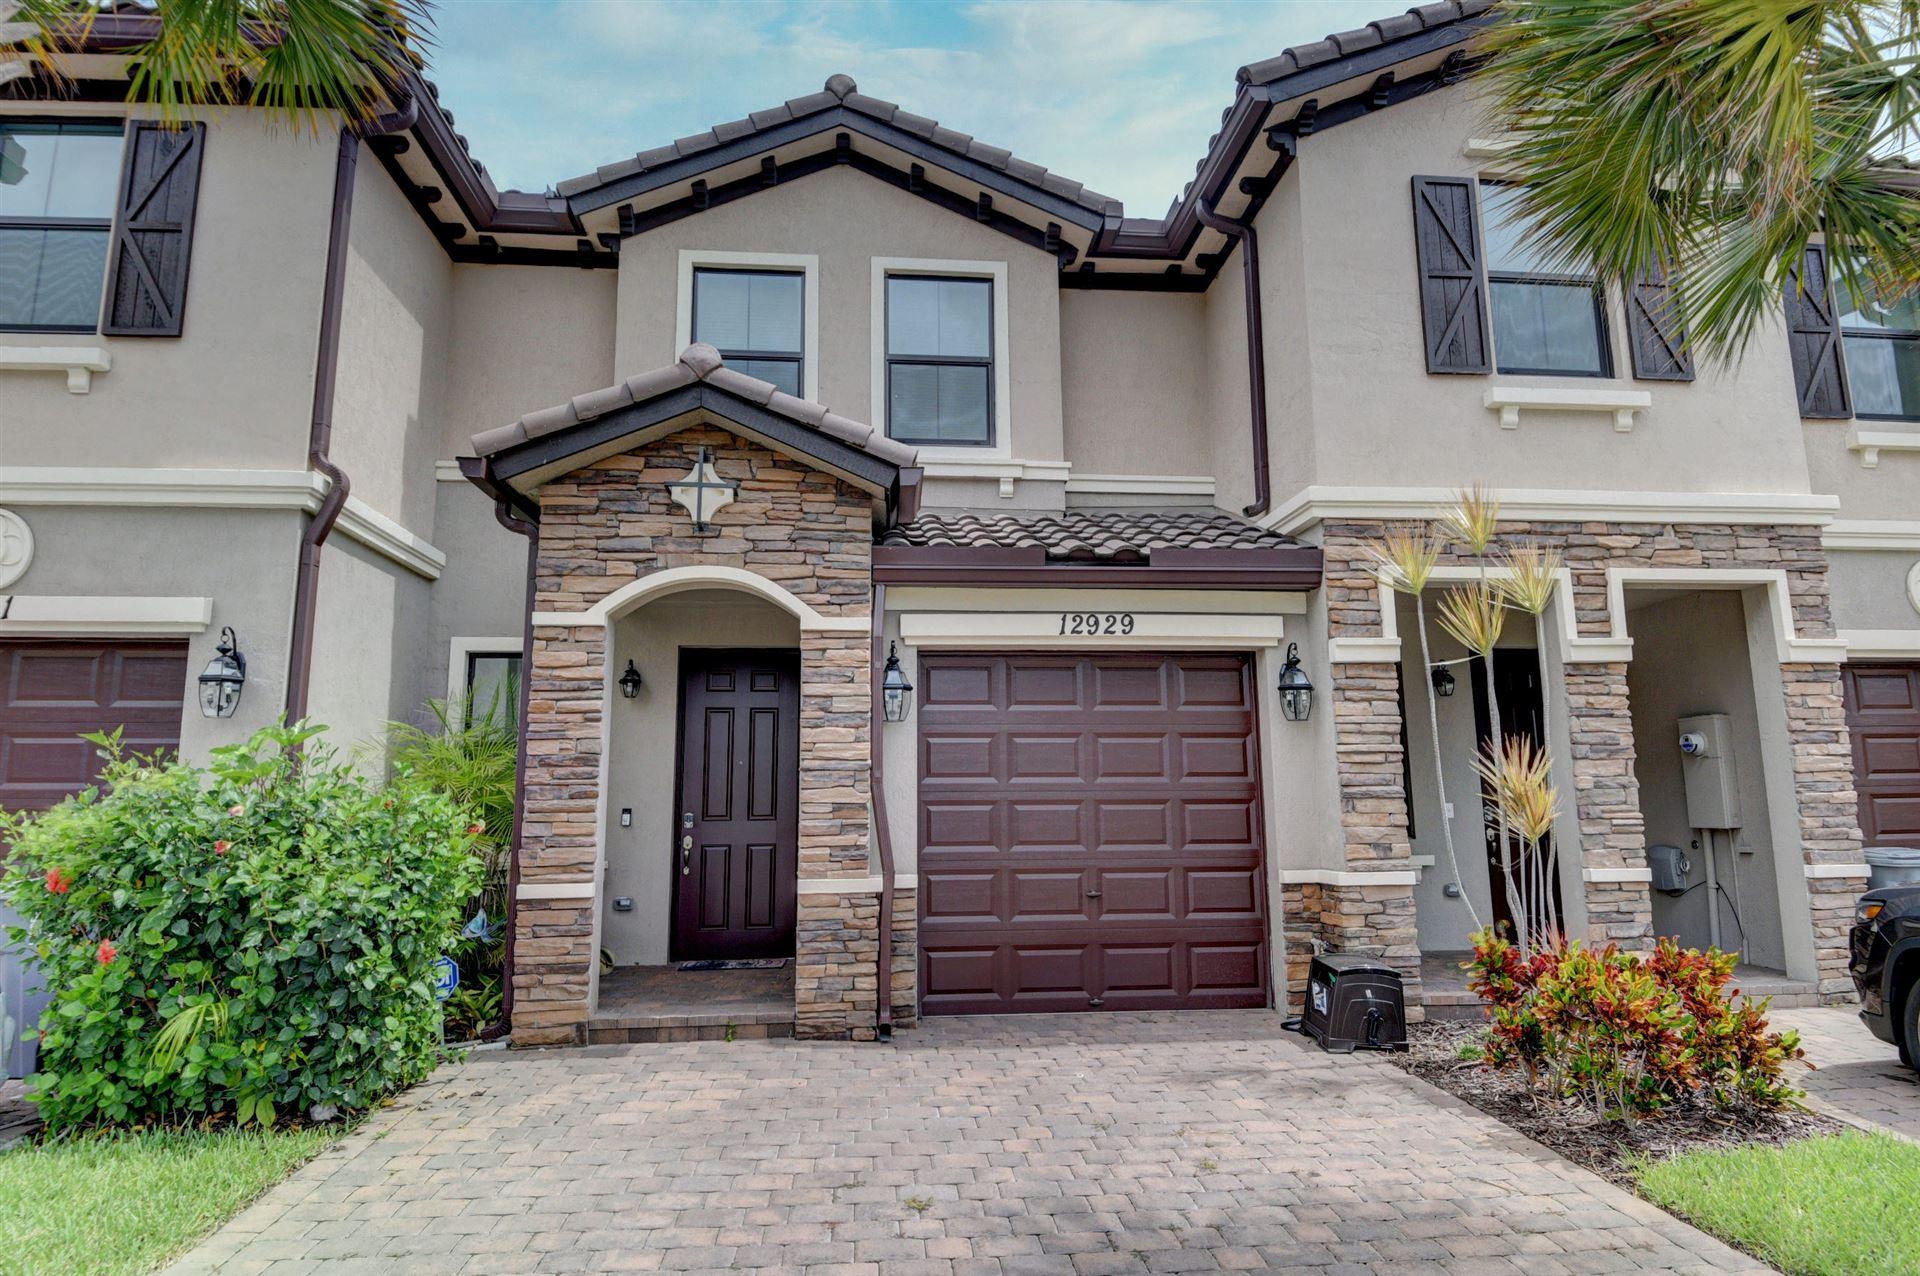 12929 Anthorne Lane, Boynton Beach, FL 33436 - #: RX-10626961